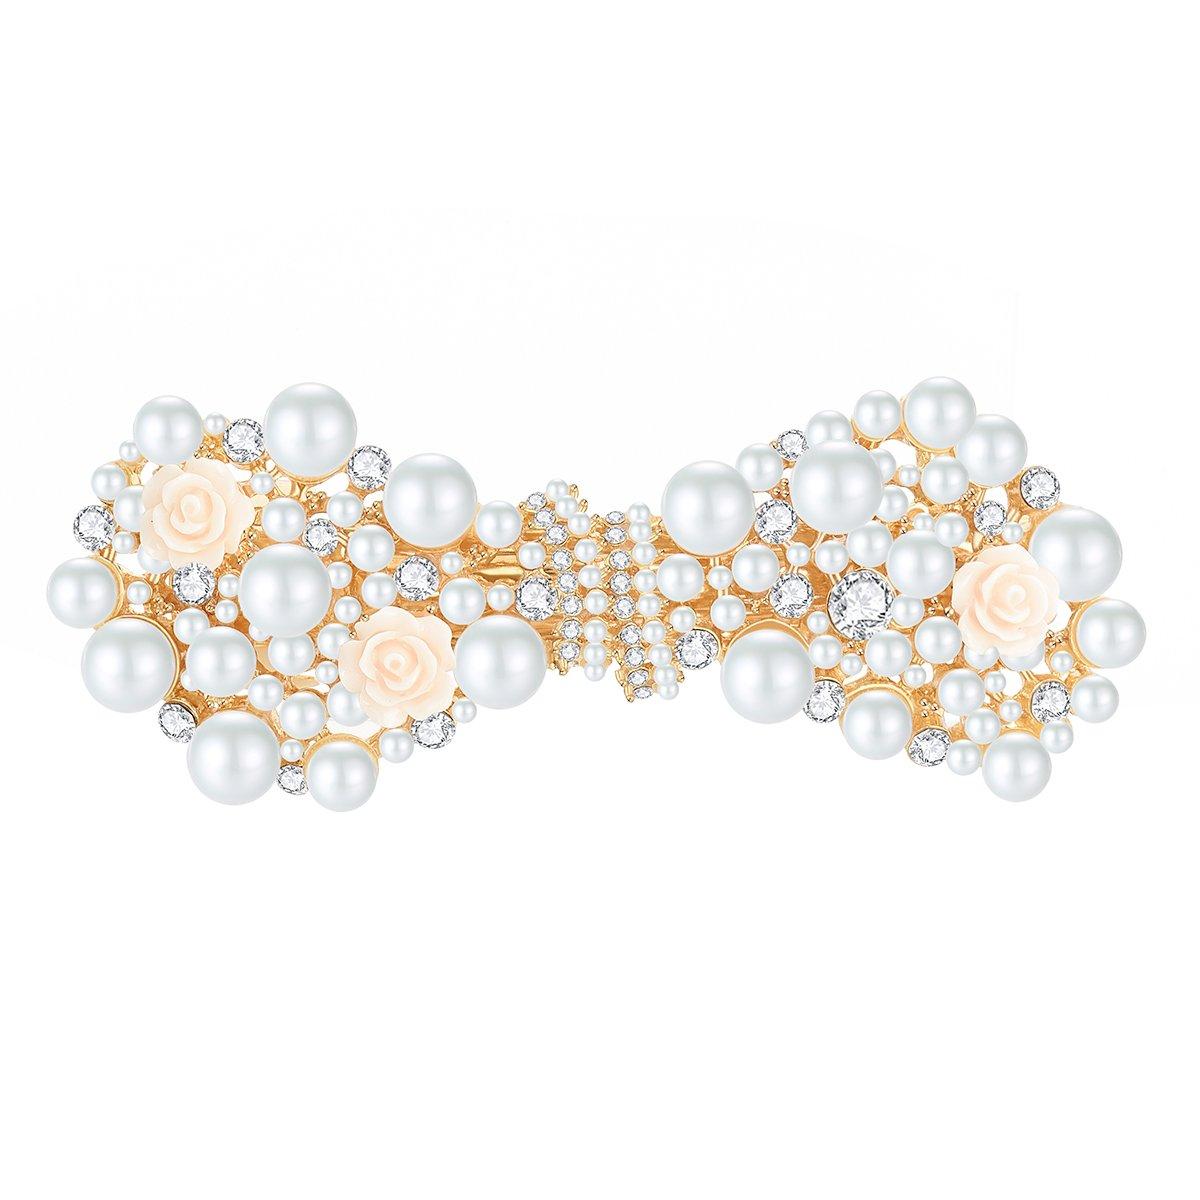 Handmade Bridal Flower Hair Clips with Simulated Pearl Wedding Bridesmaid Accessories 17ZTD5054-5059